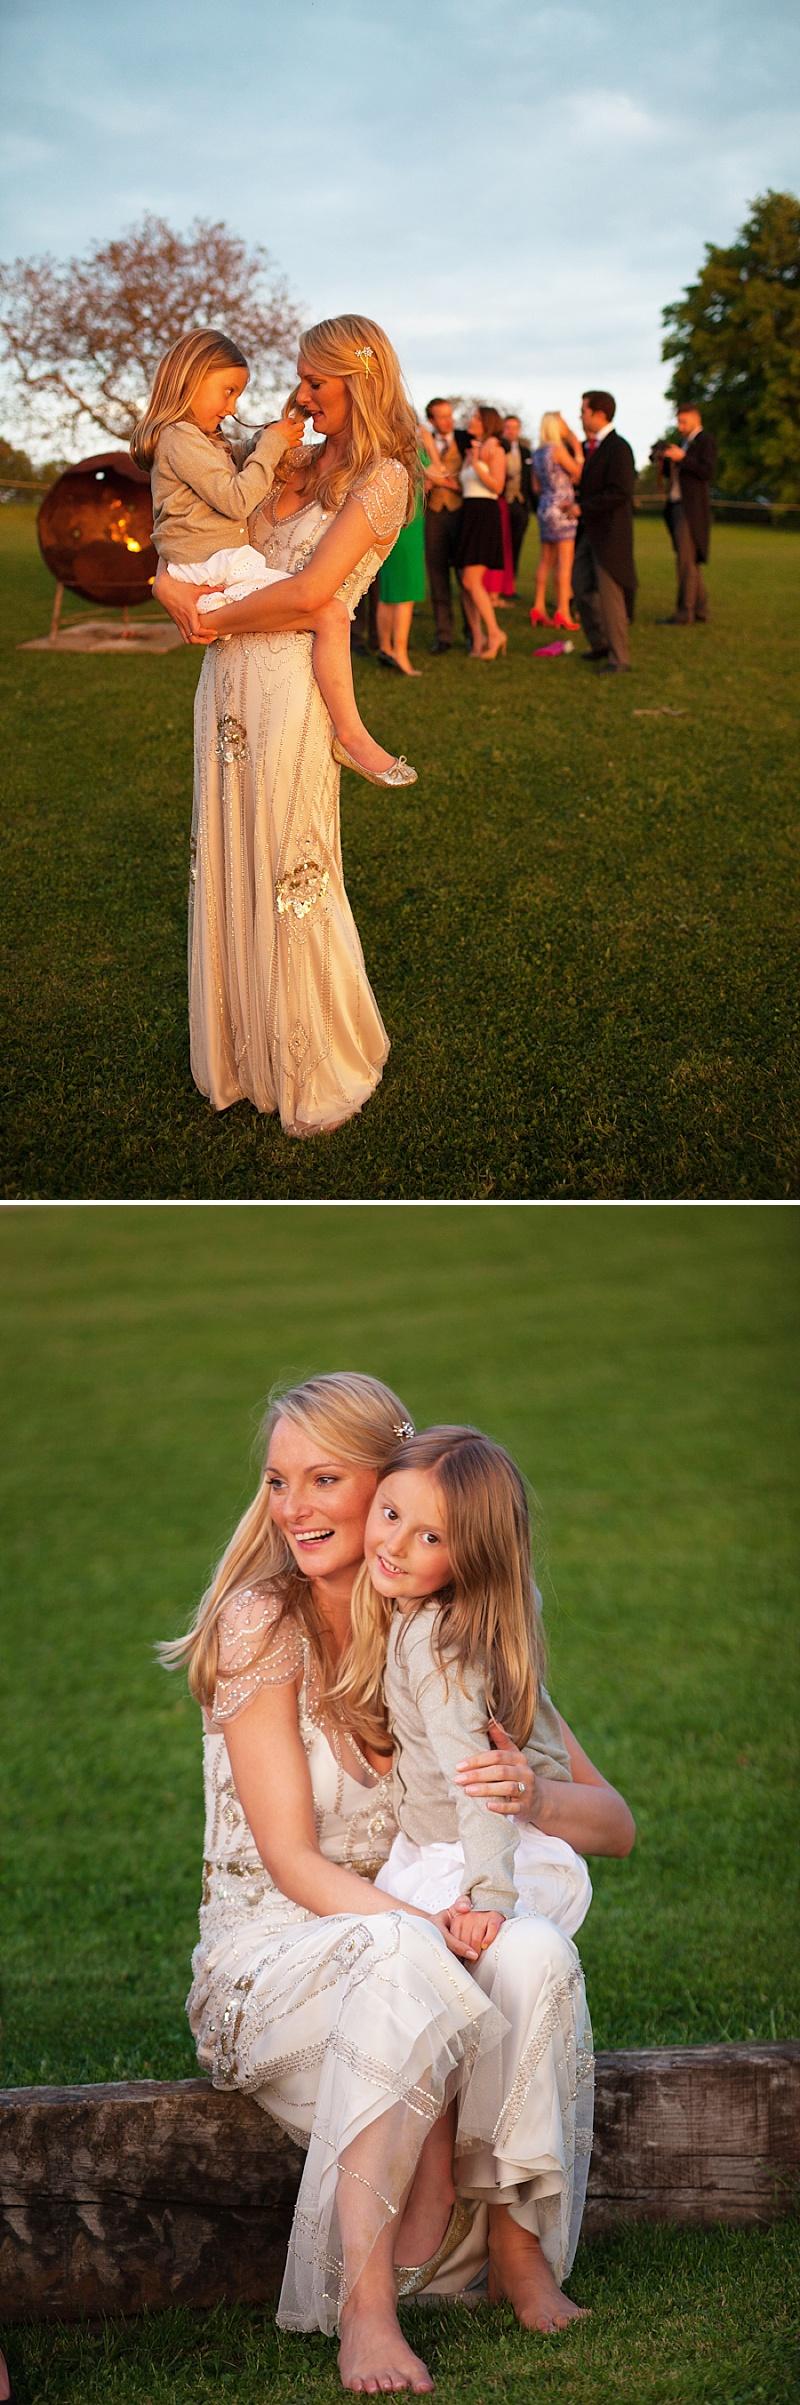 Summer Garden Party Wedding In Hertfordshire, Bride In Jenny Packham Eden Gown, Images by Annamarie Stepney_0016